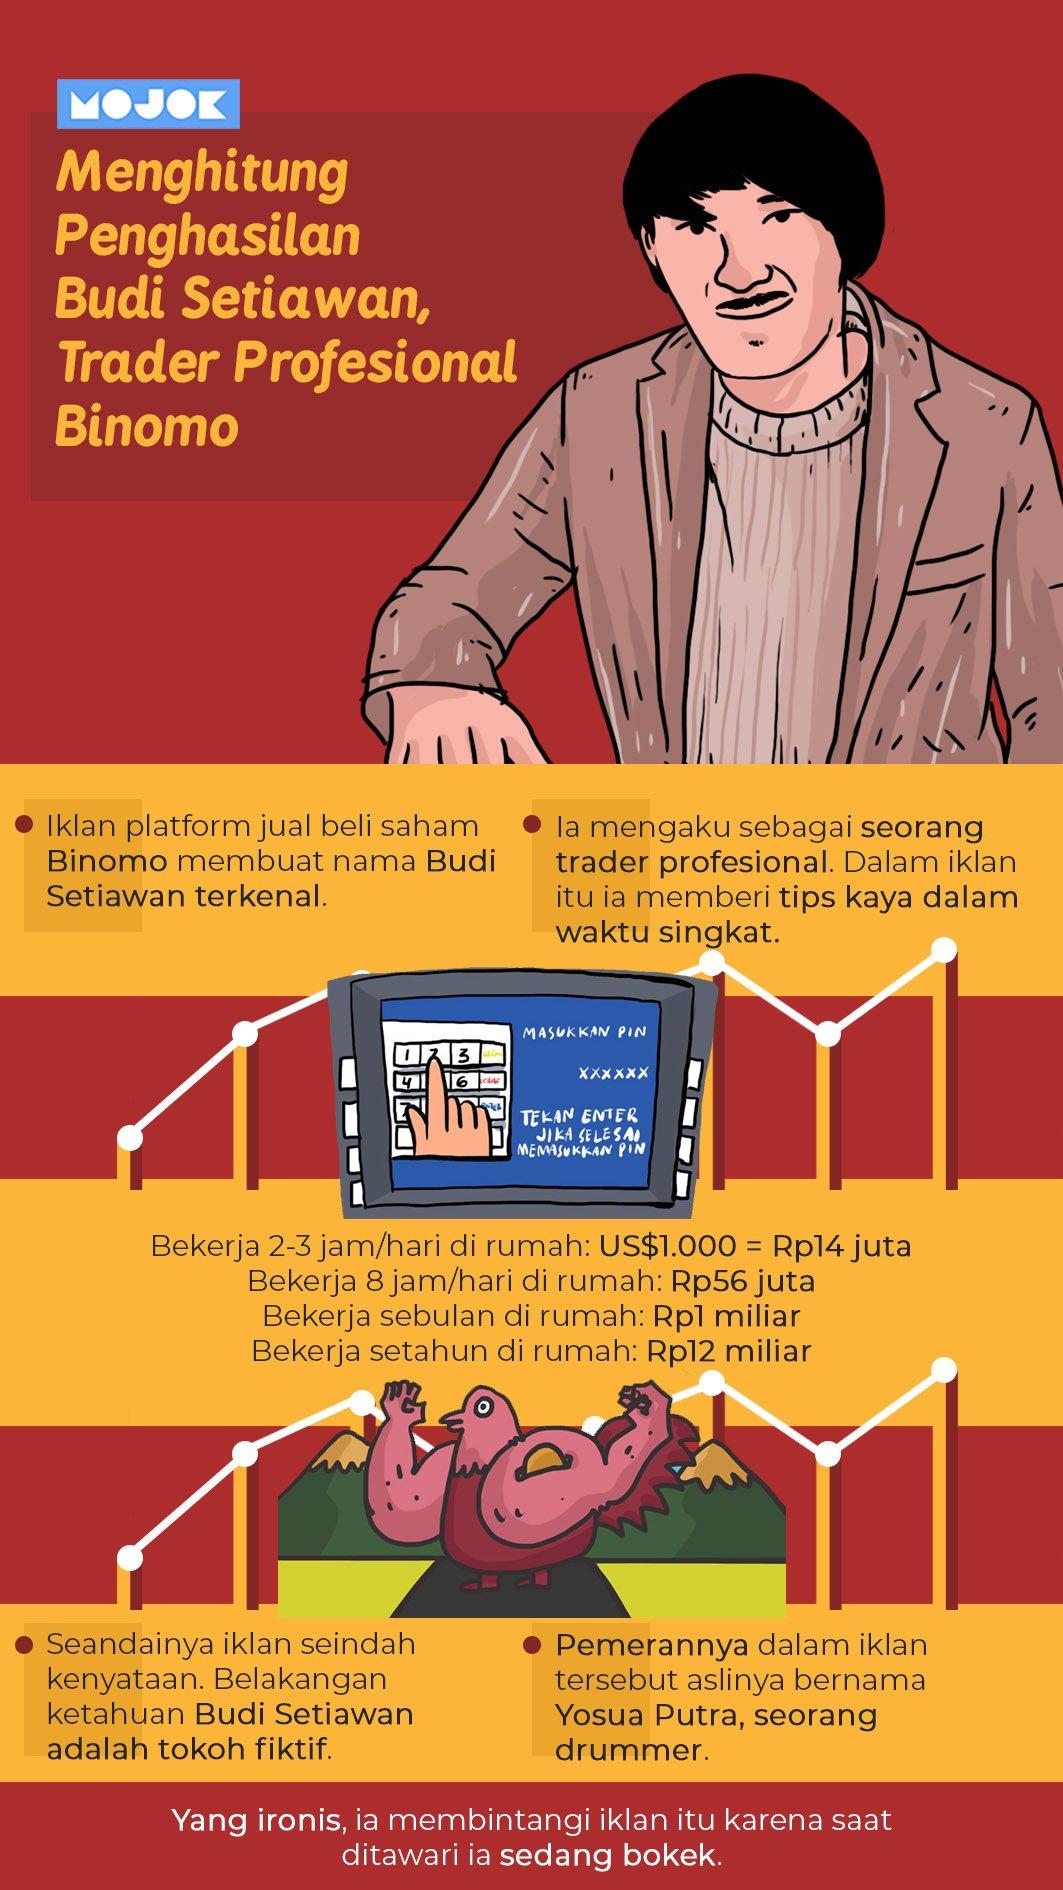 budi setiawan binomo trader profesional menghitung penghasilan kekayaan nama asli pemeran iklan yosua putra mojok.co